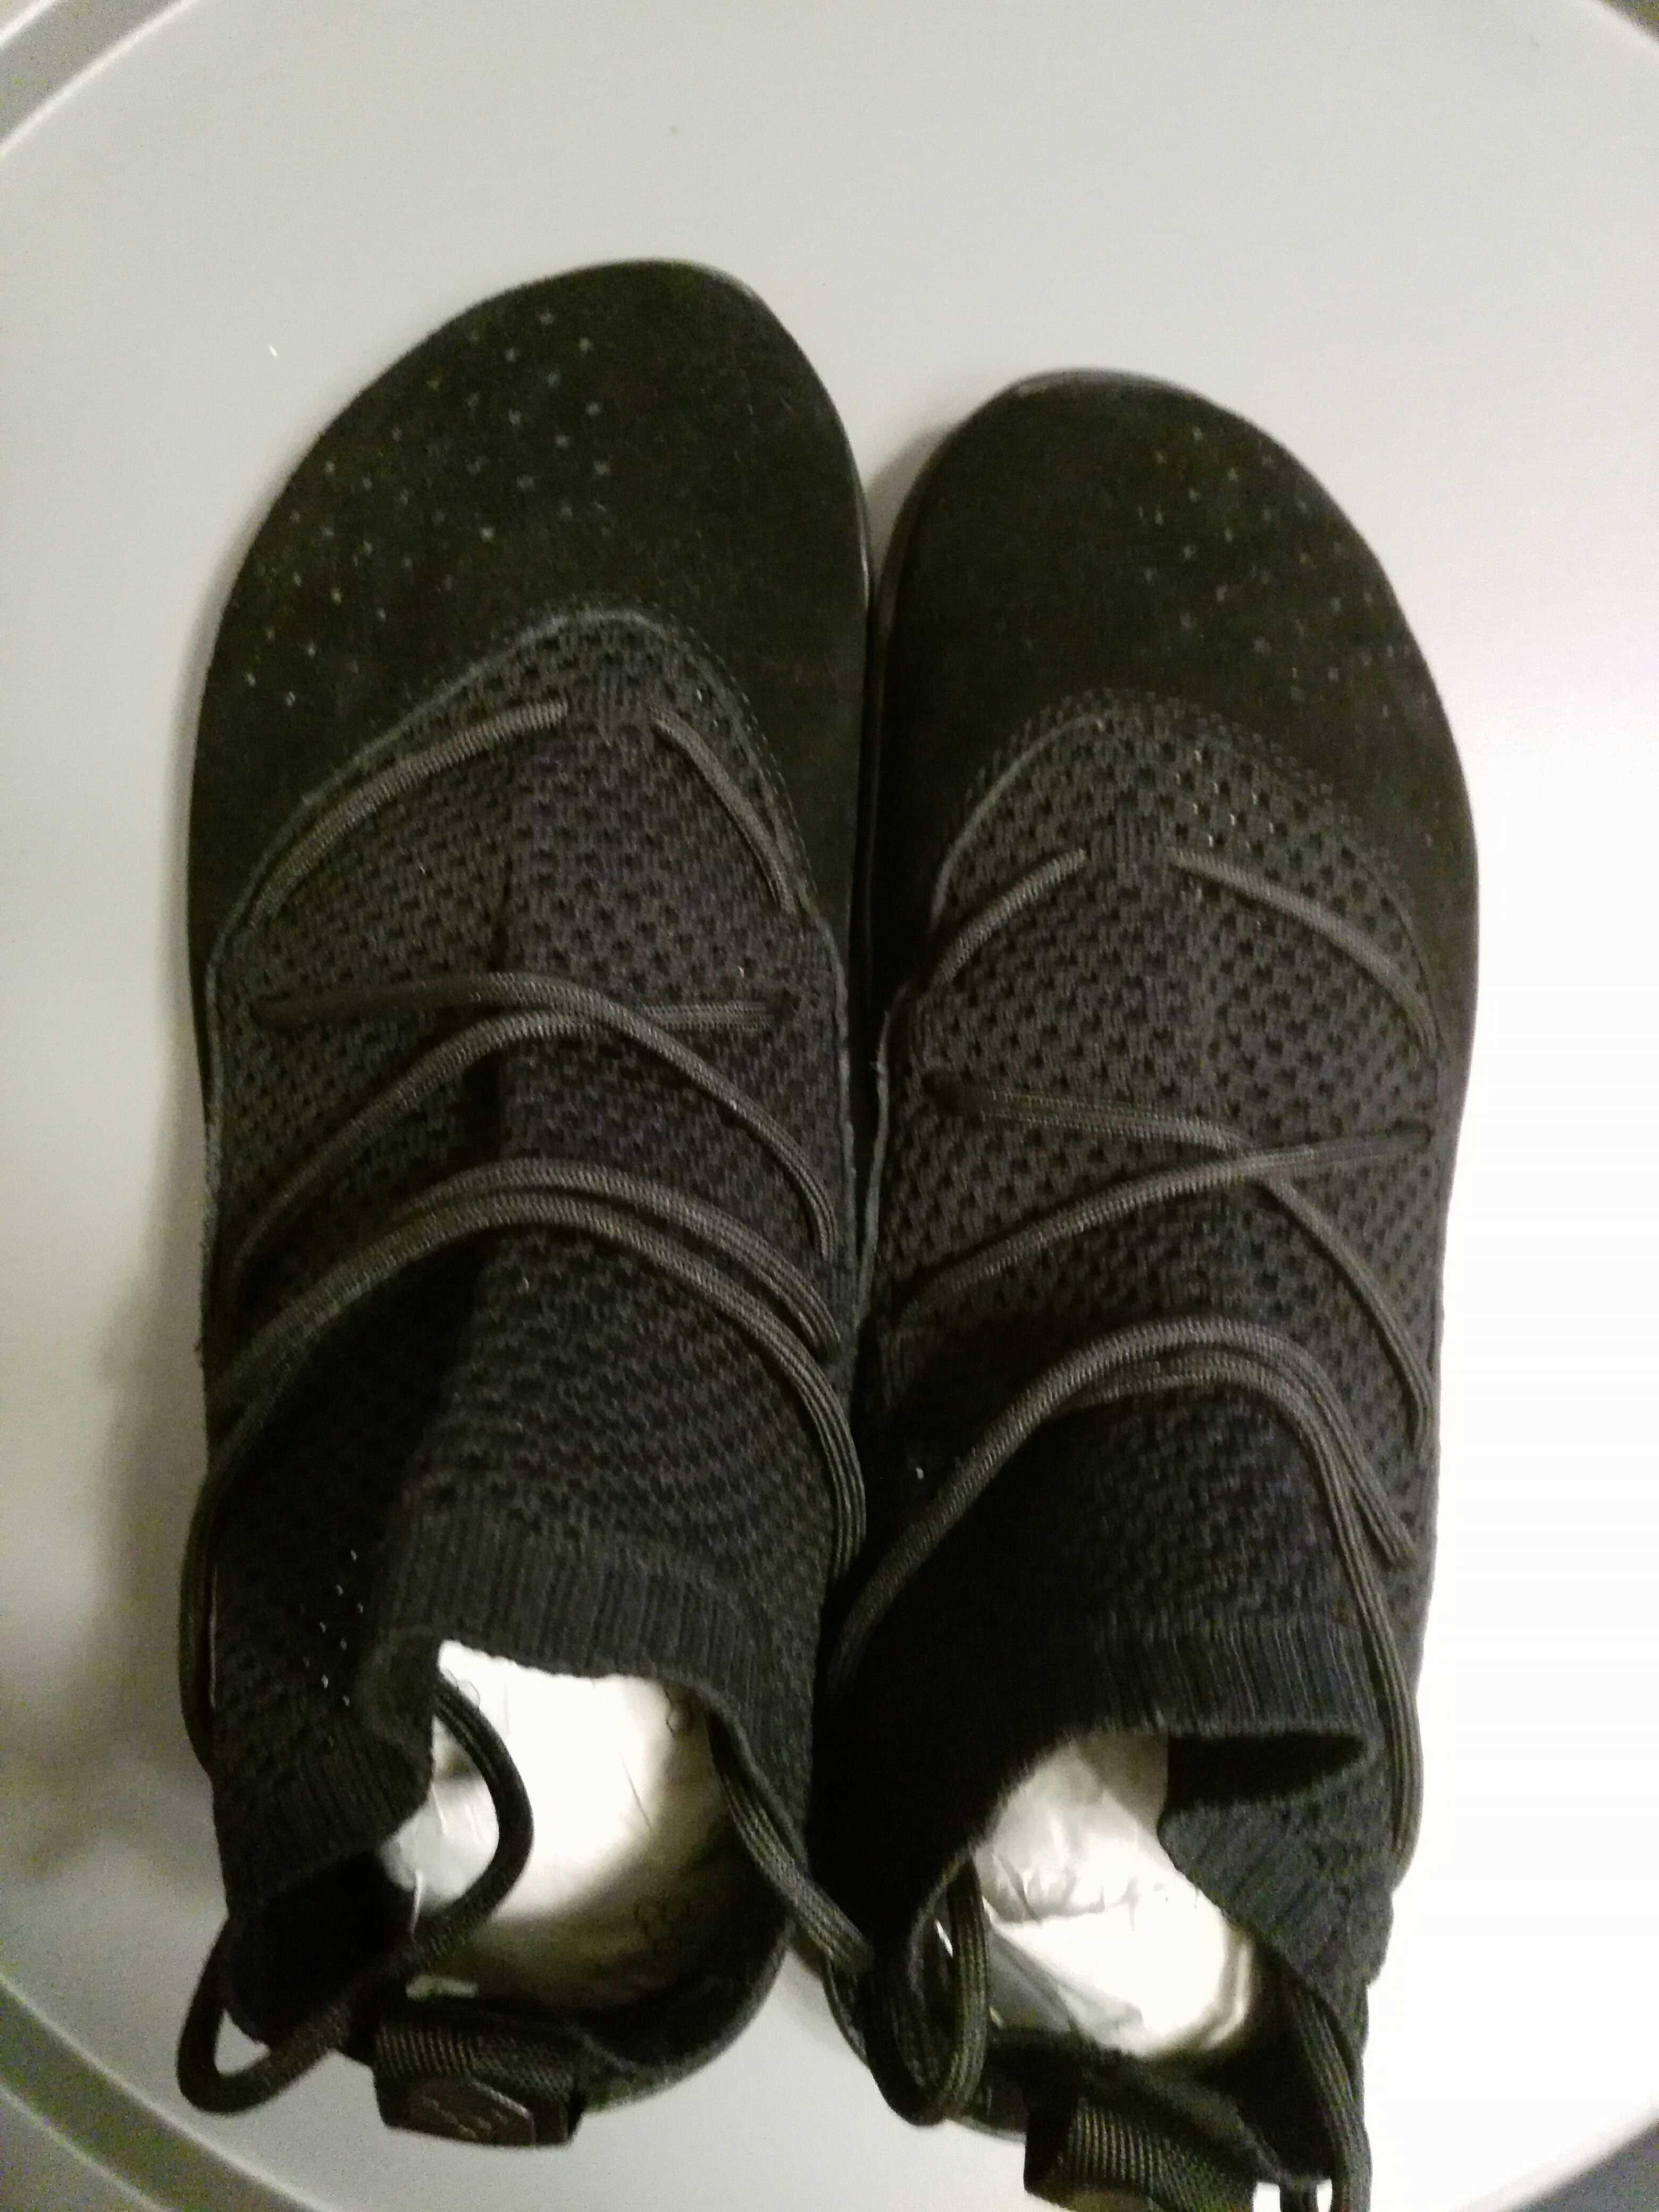 Bild Nummer 2 von VIVOBAREFOOT Barfuß-Sneakerboot Kanna Sock Knit Ladies